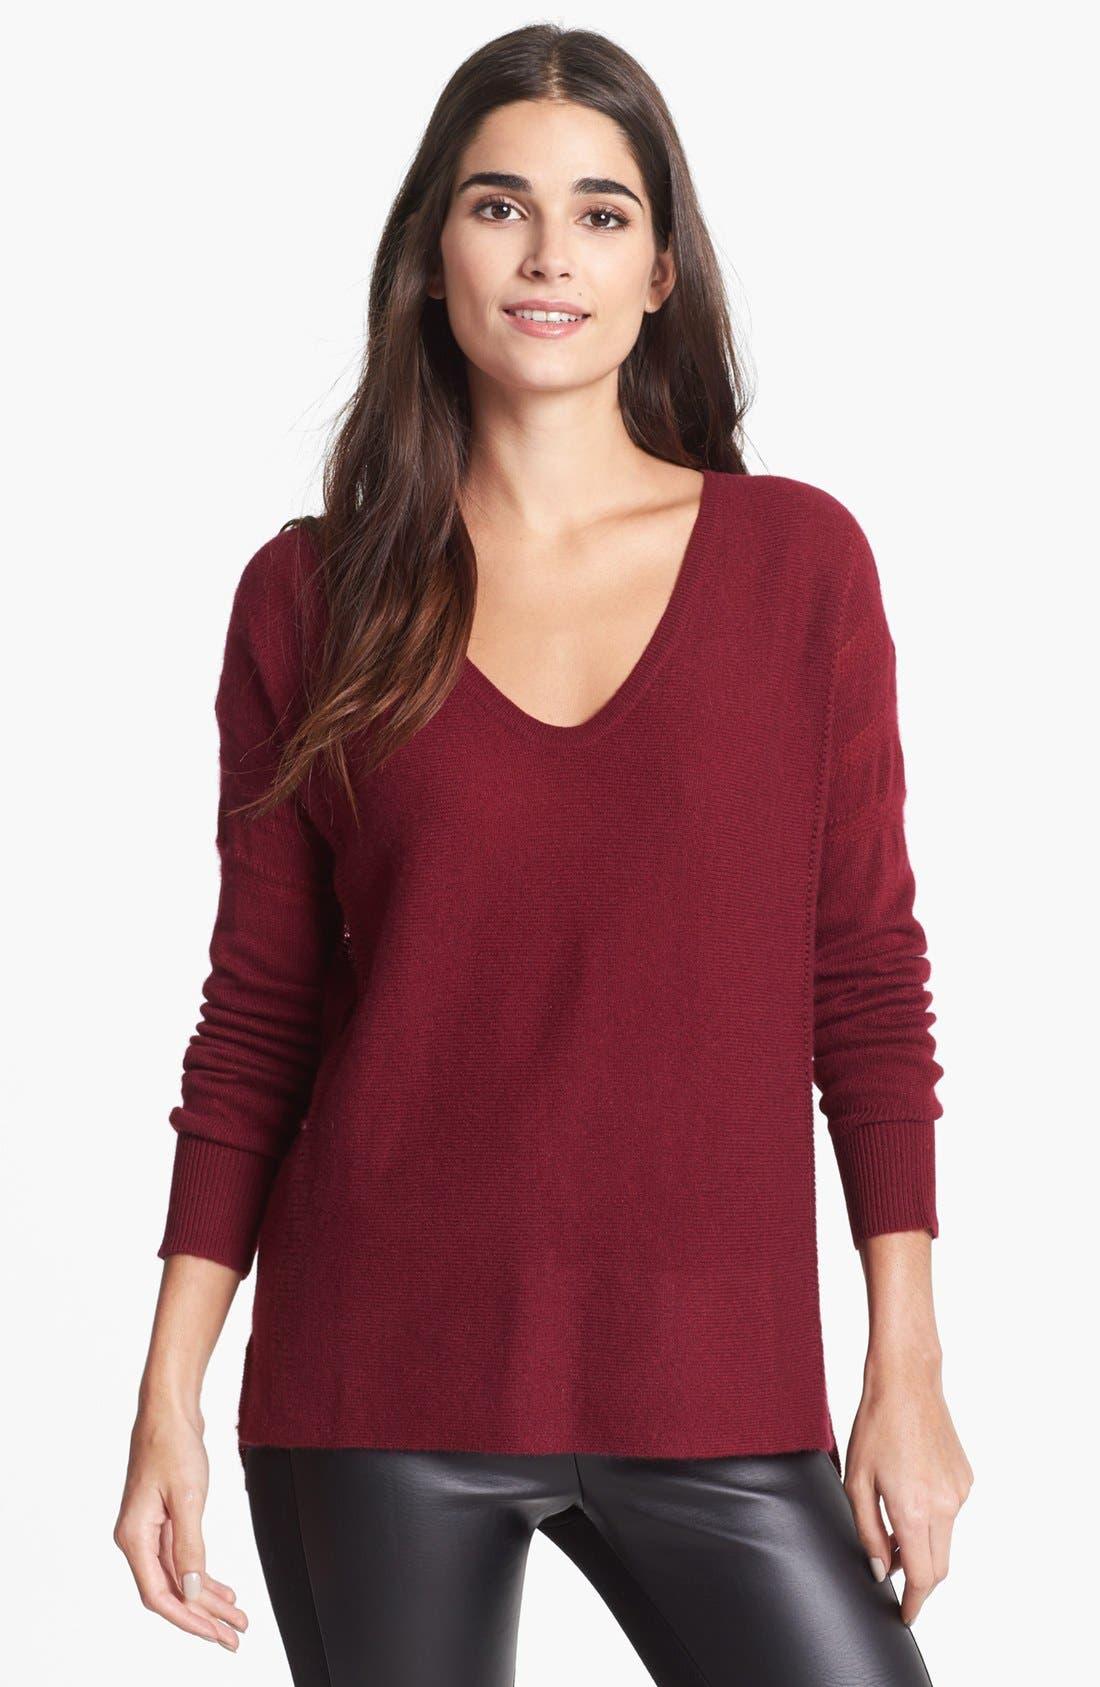 Main Image - White + Warren V-Neck Cashmere Sweater